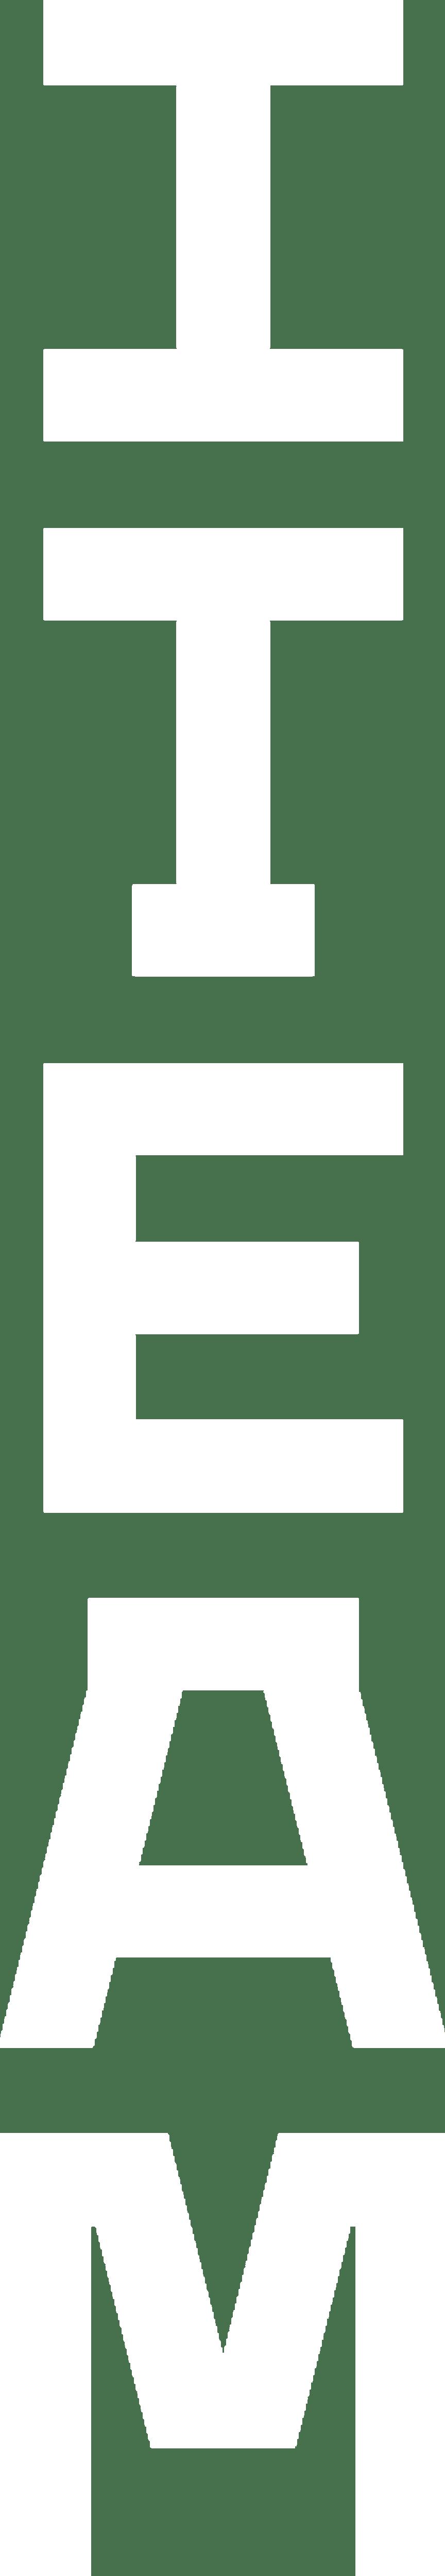 Iteam-Logotype-Vertical-RGB-White